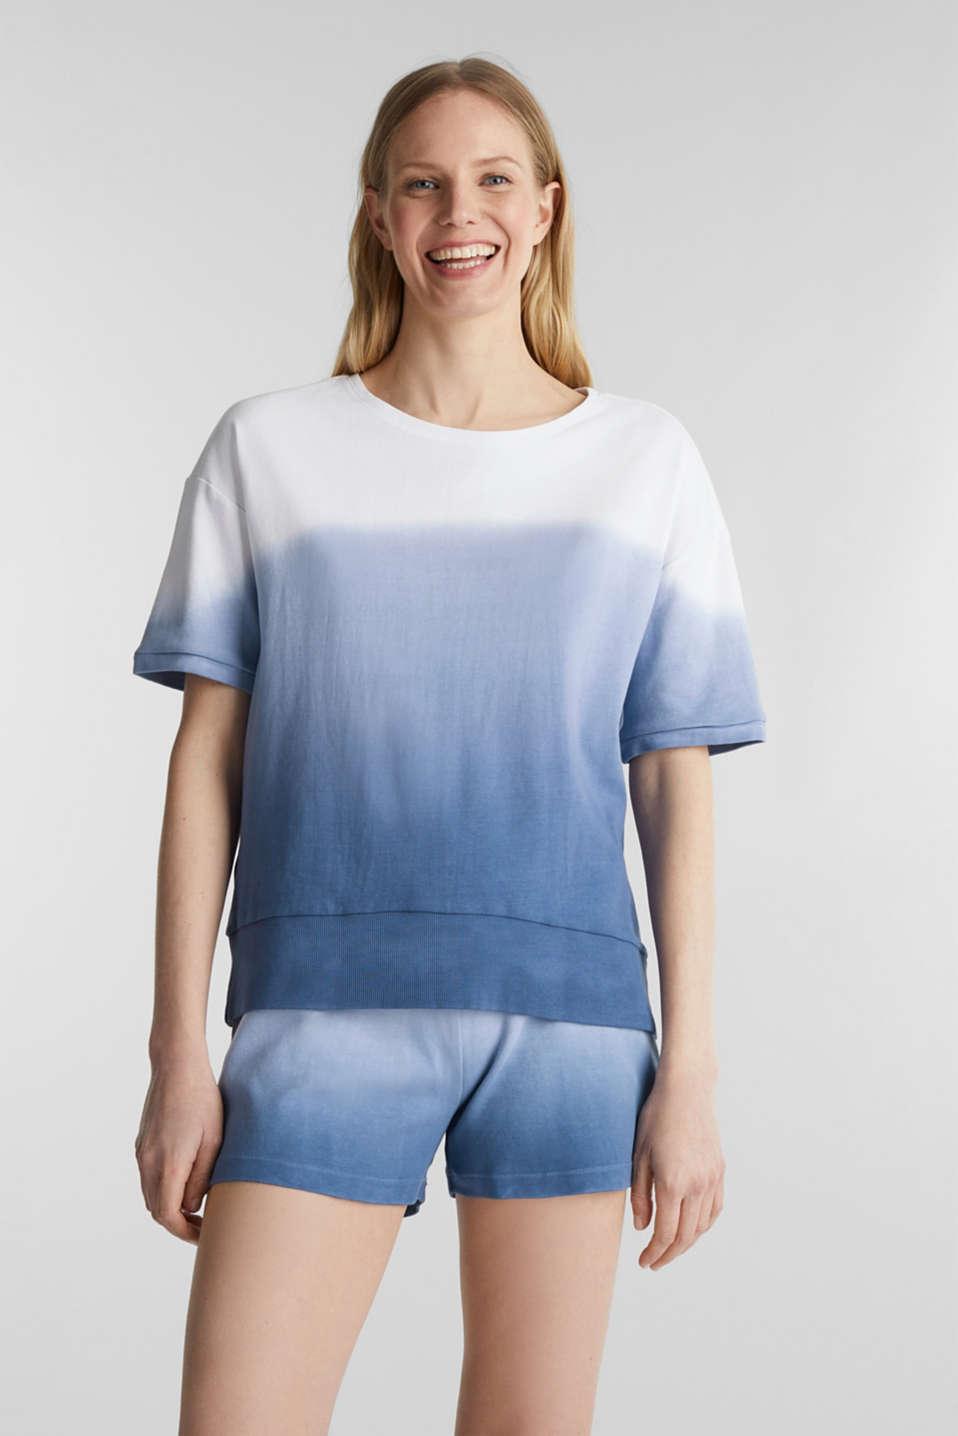 Dip-dye top, 100% cotton, BLUE LAVENDER, detail image number 1